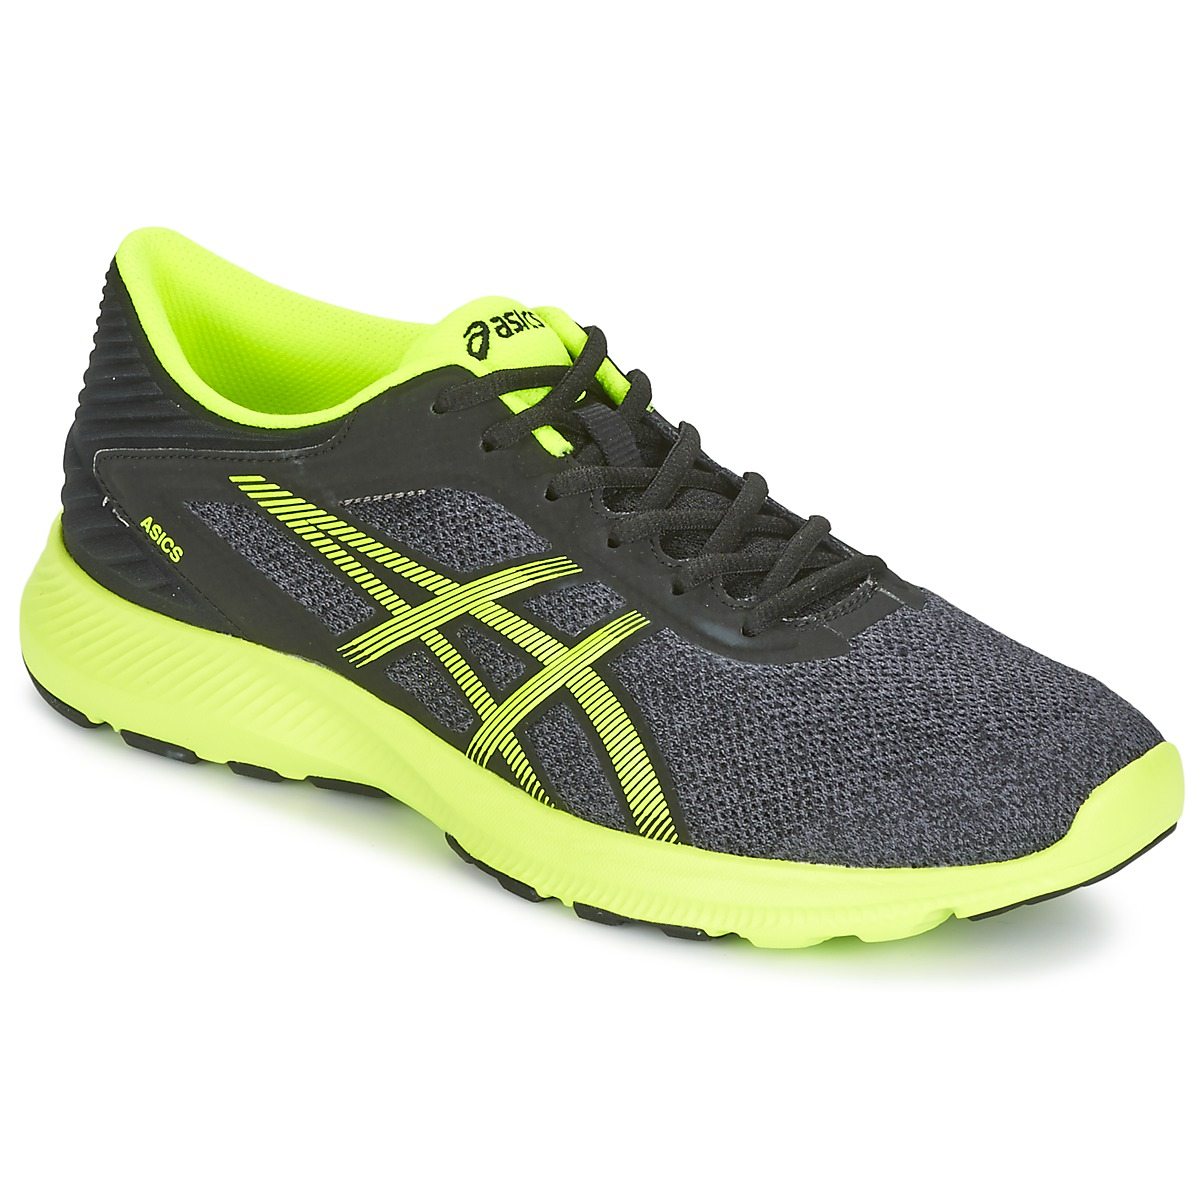 Chaussures-de-running Asics NITROFUZE Gris / Jaune